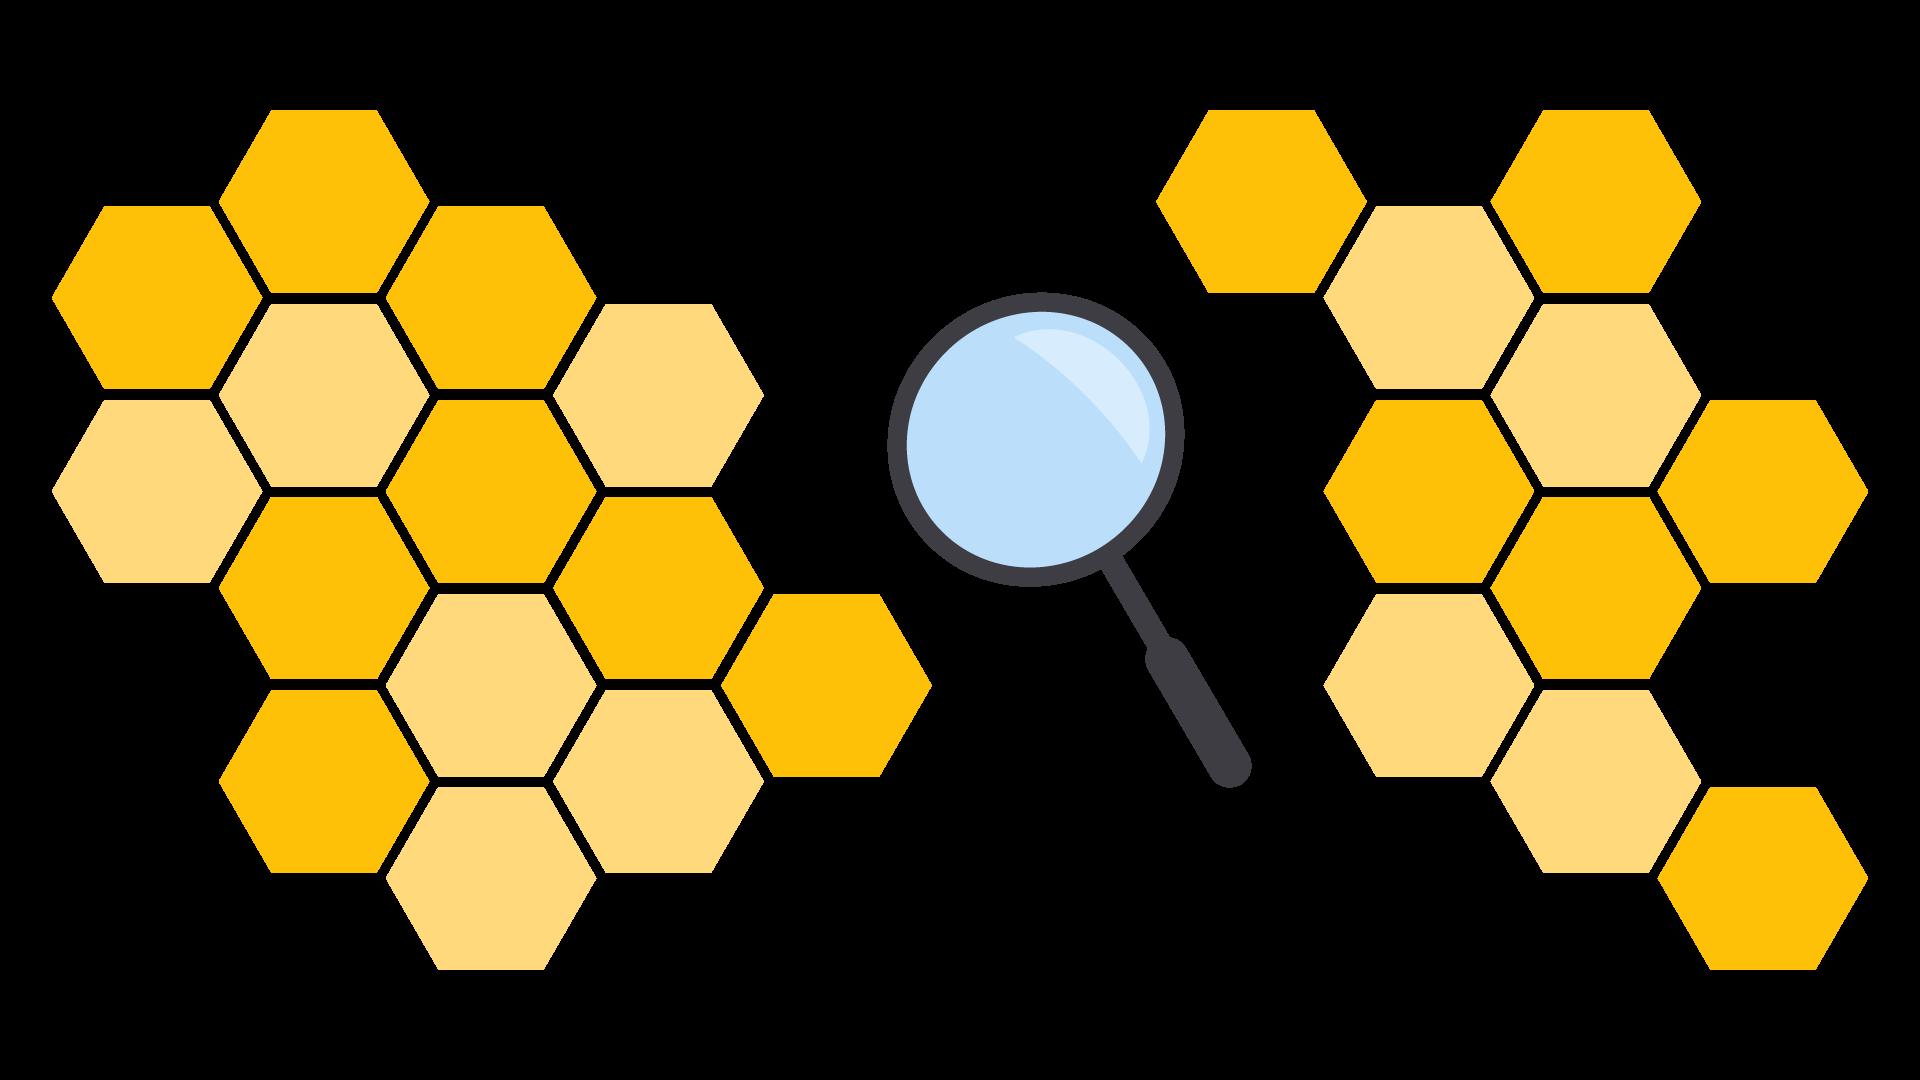 Writing a hive udf. Honeycomb clipart single